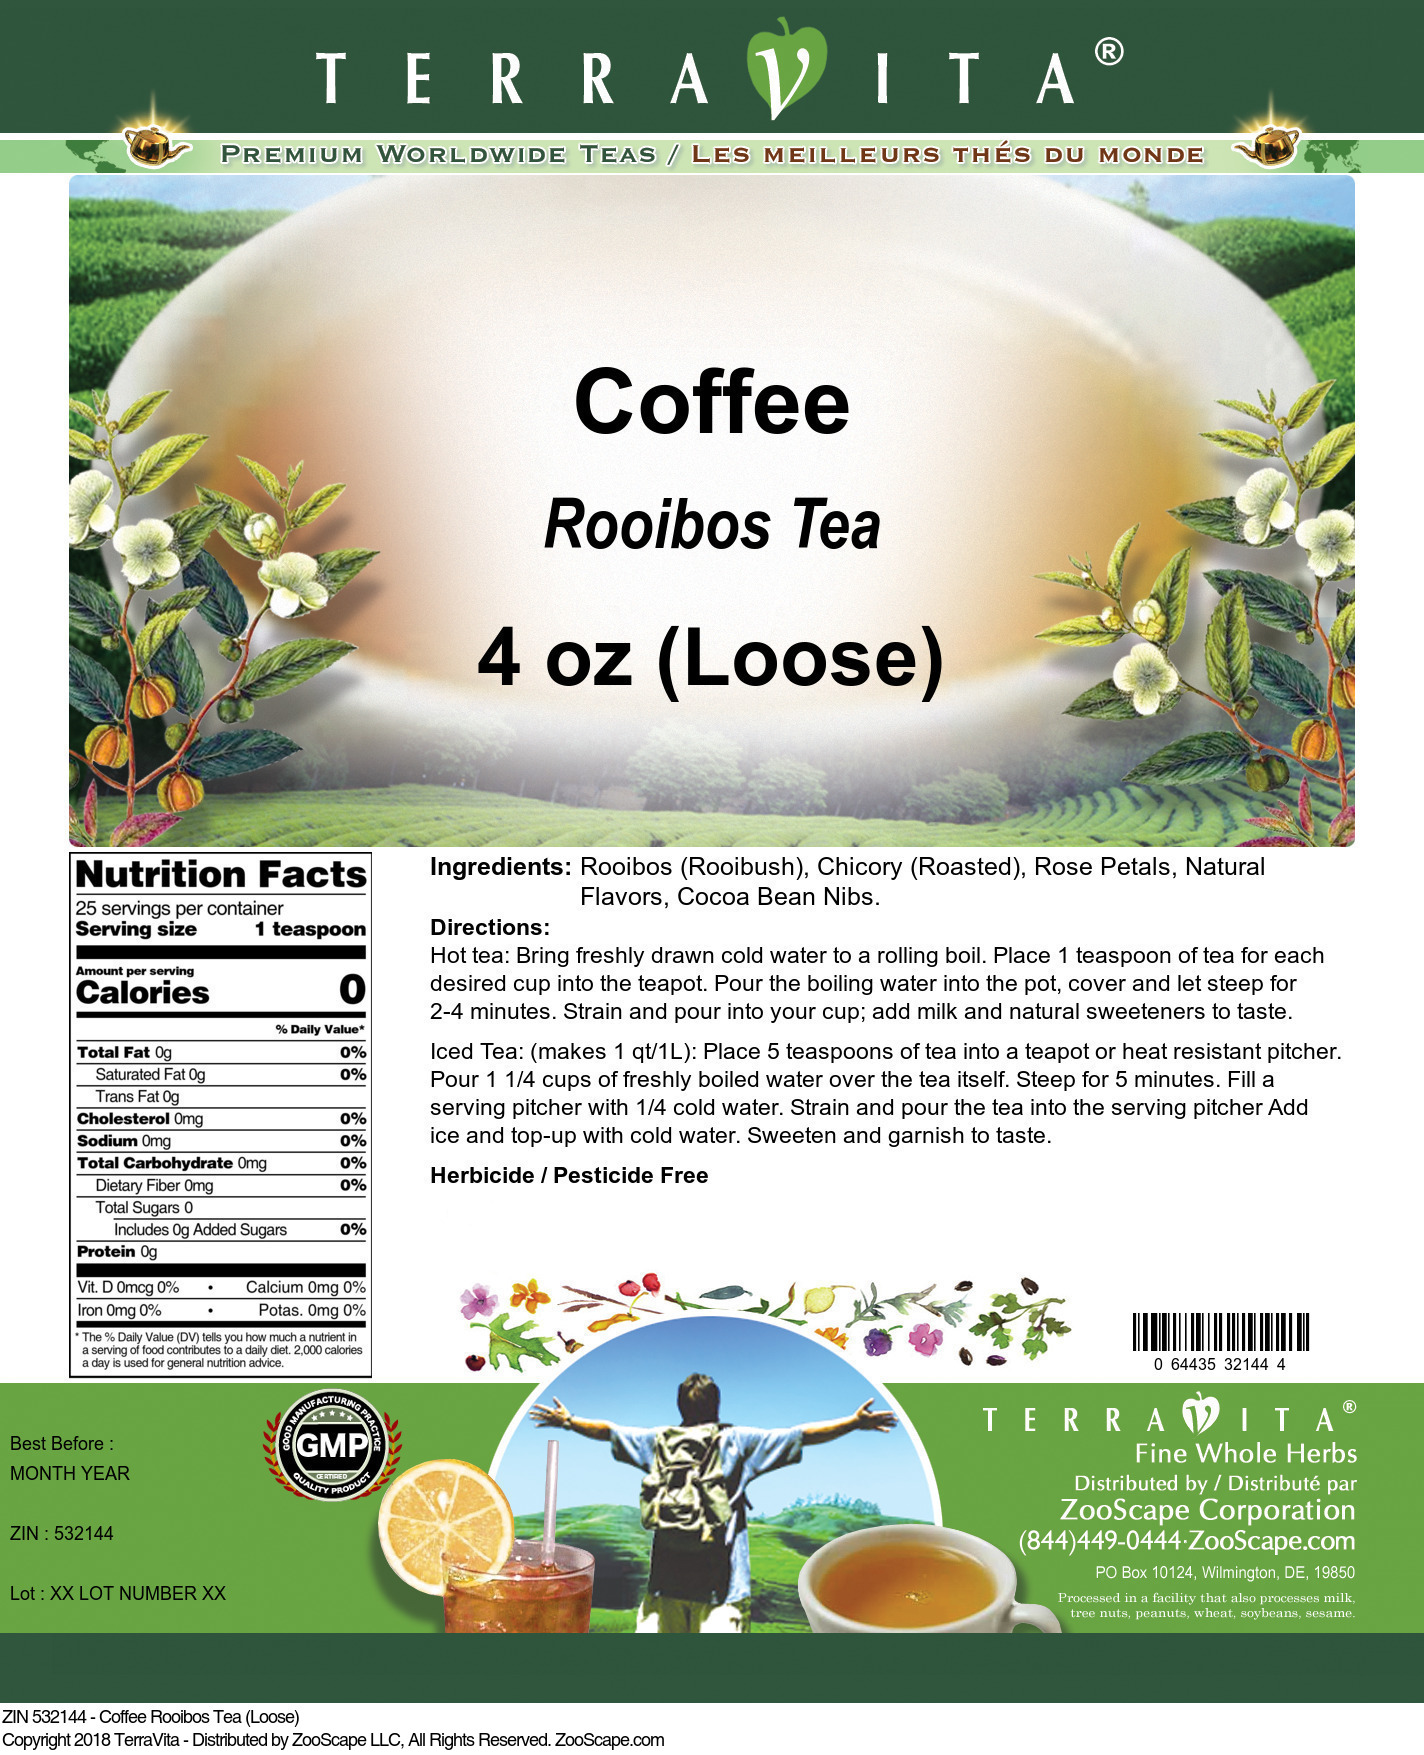 Coffee Rooibos Tea (Loose)